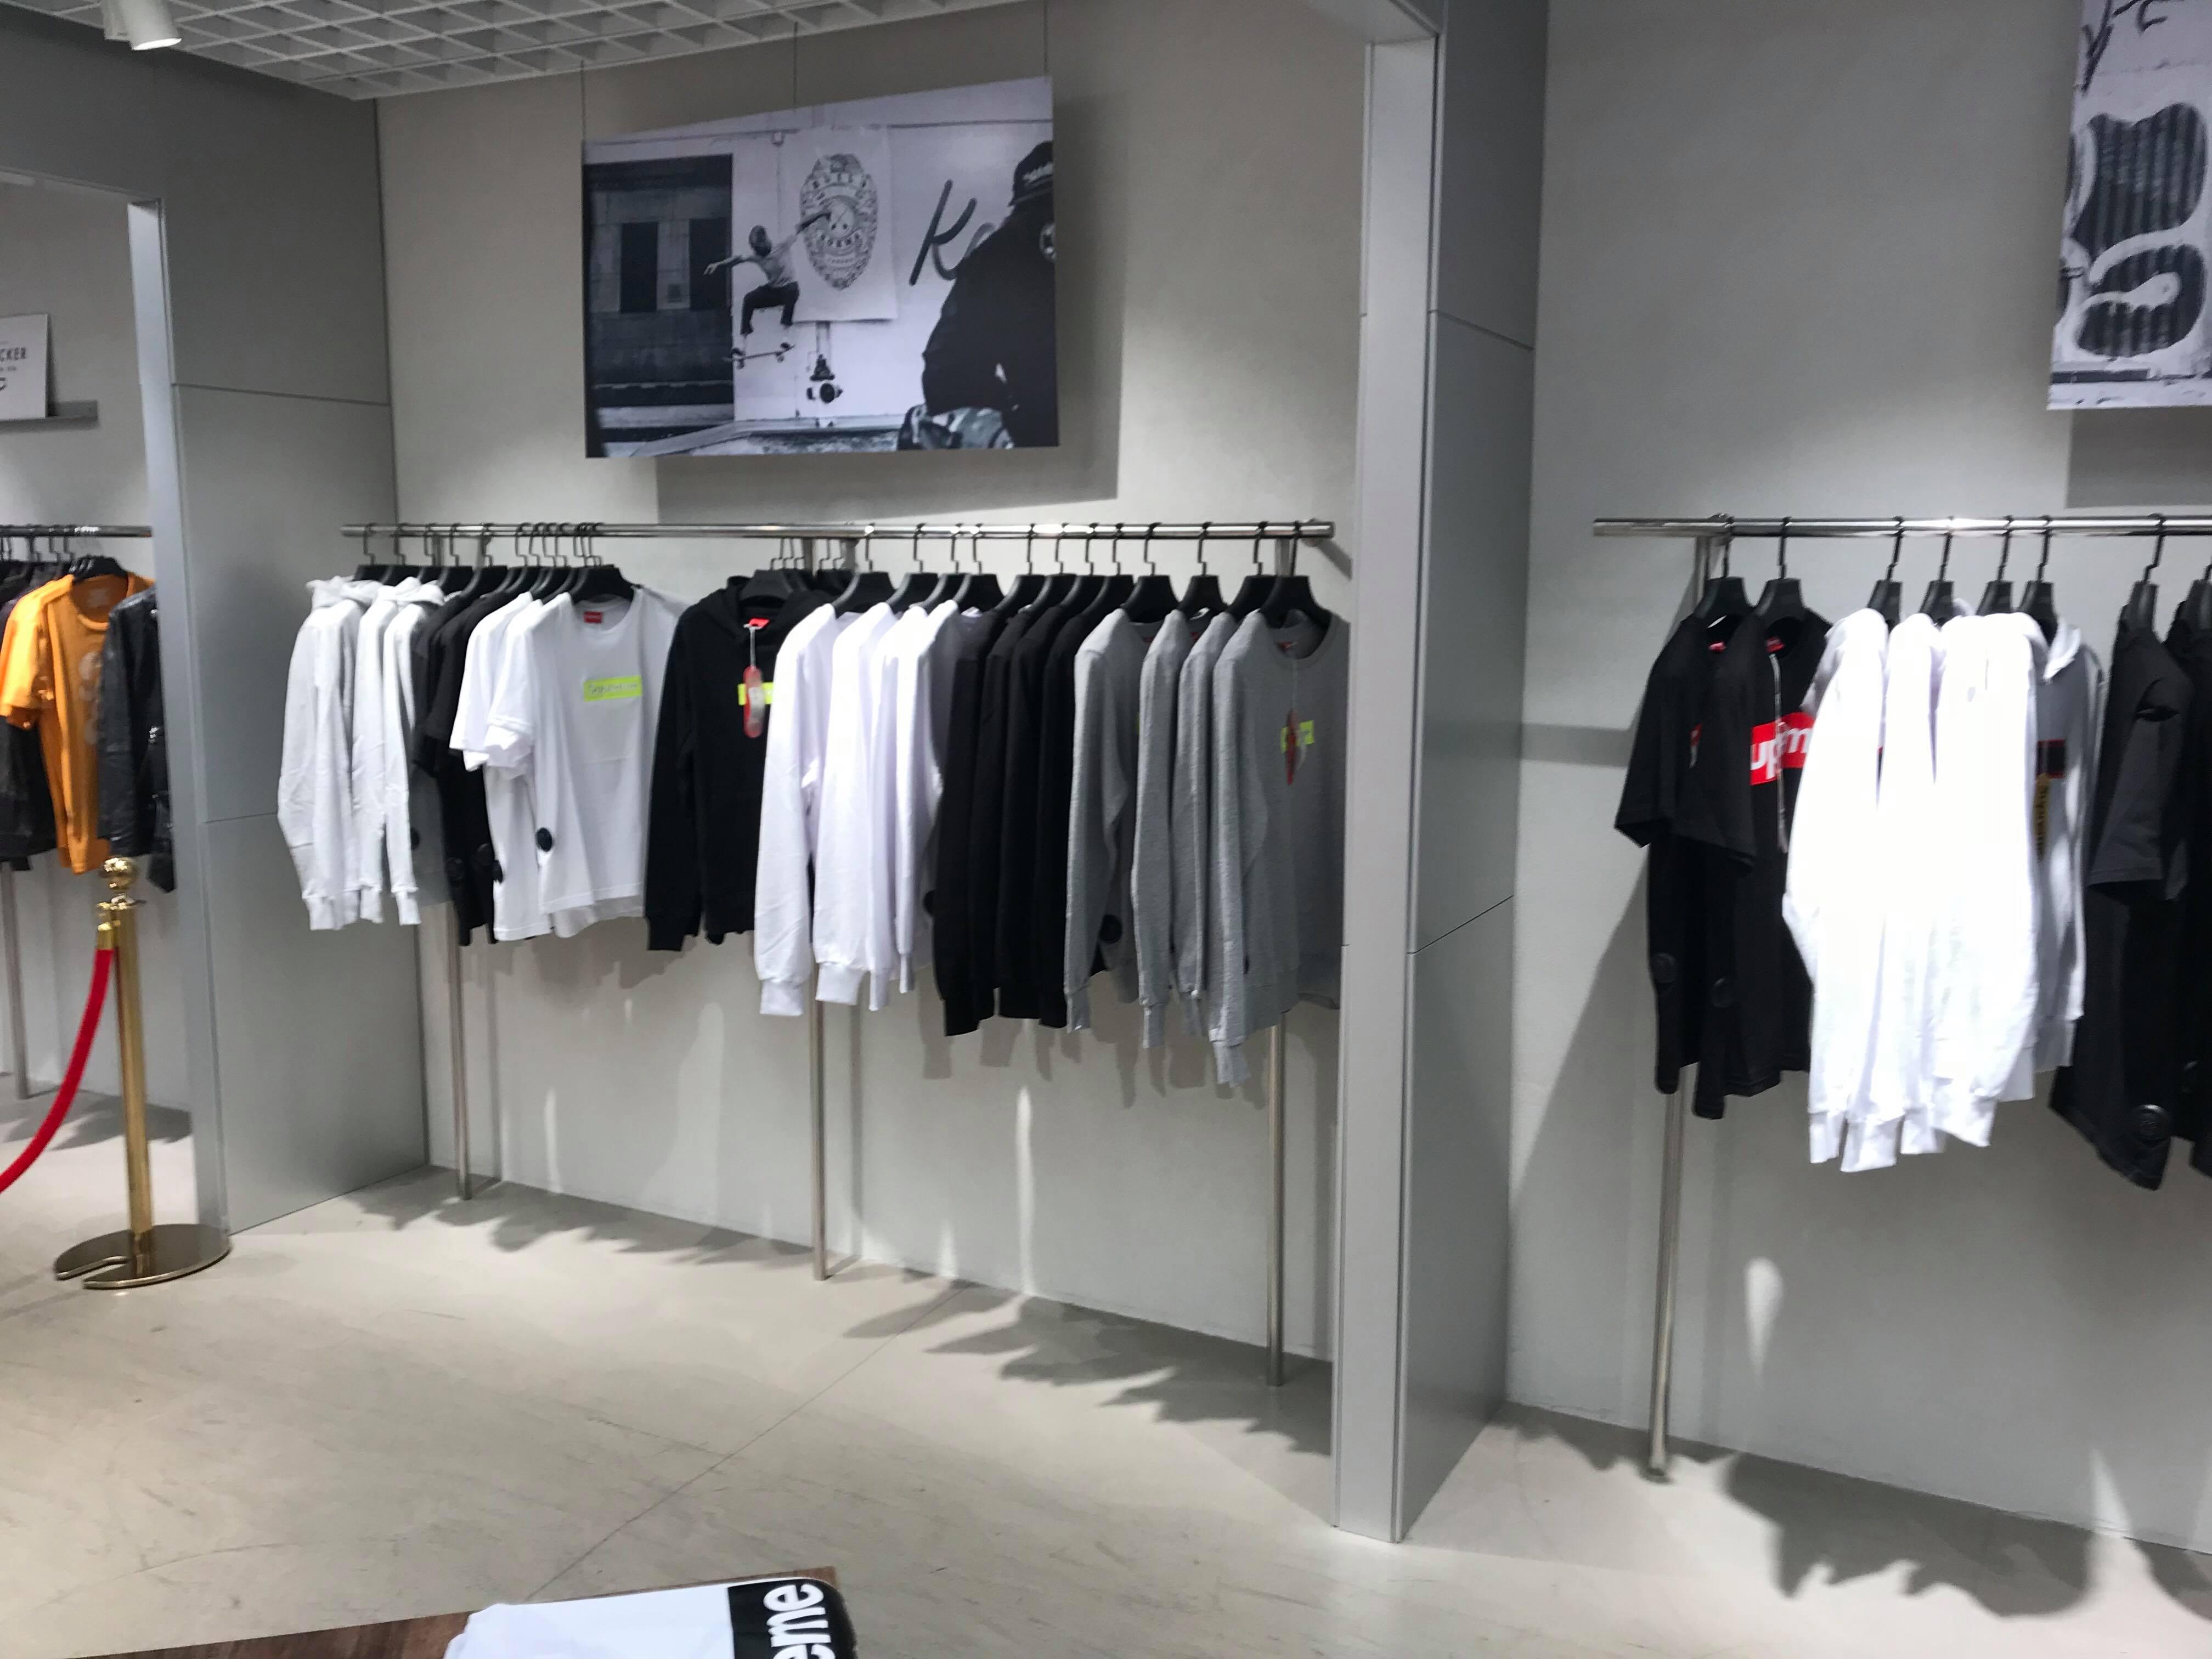 jeans mall of scandinavia